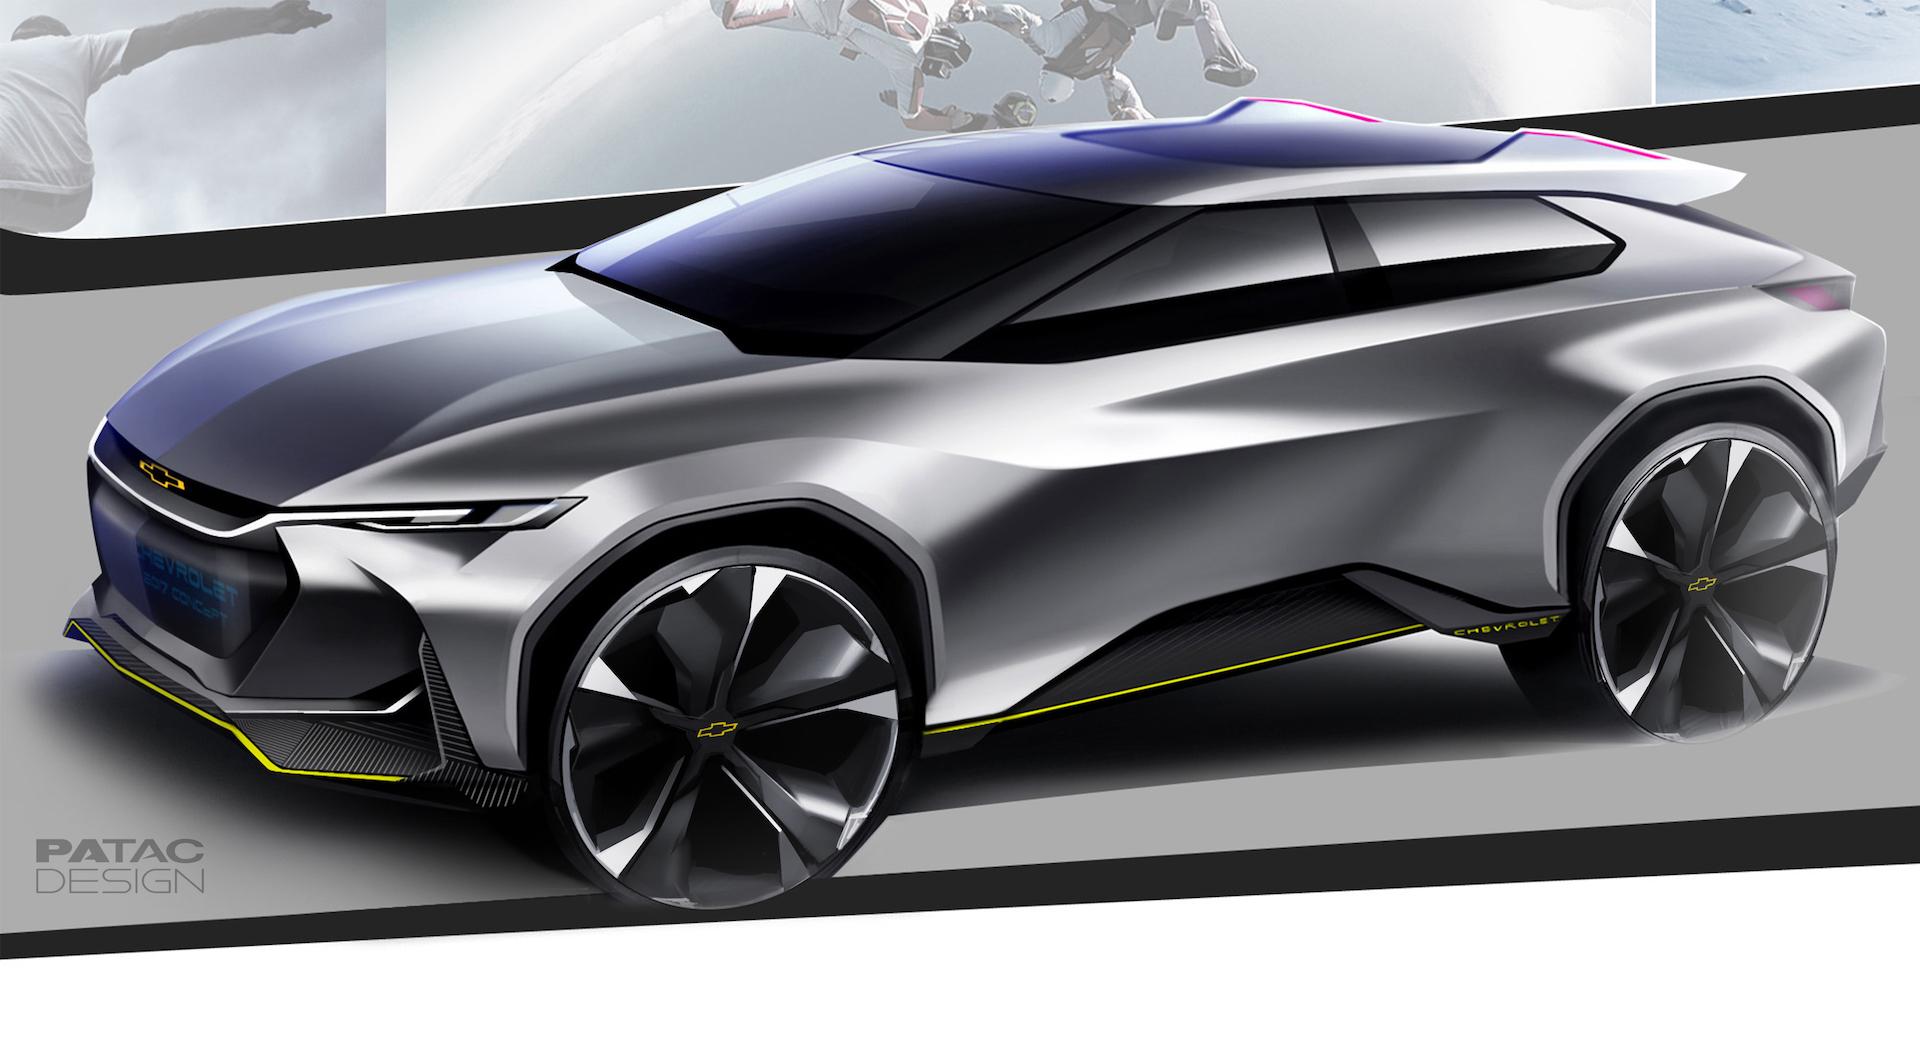 chevrolet-fnr-x-concept-2017-design-sketches-1